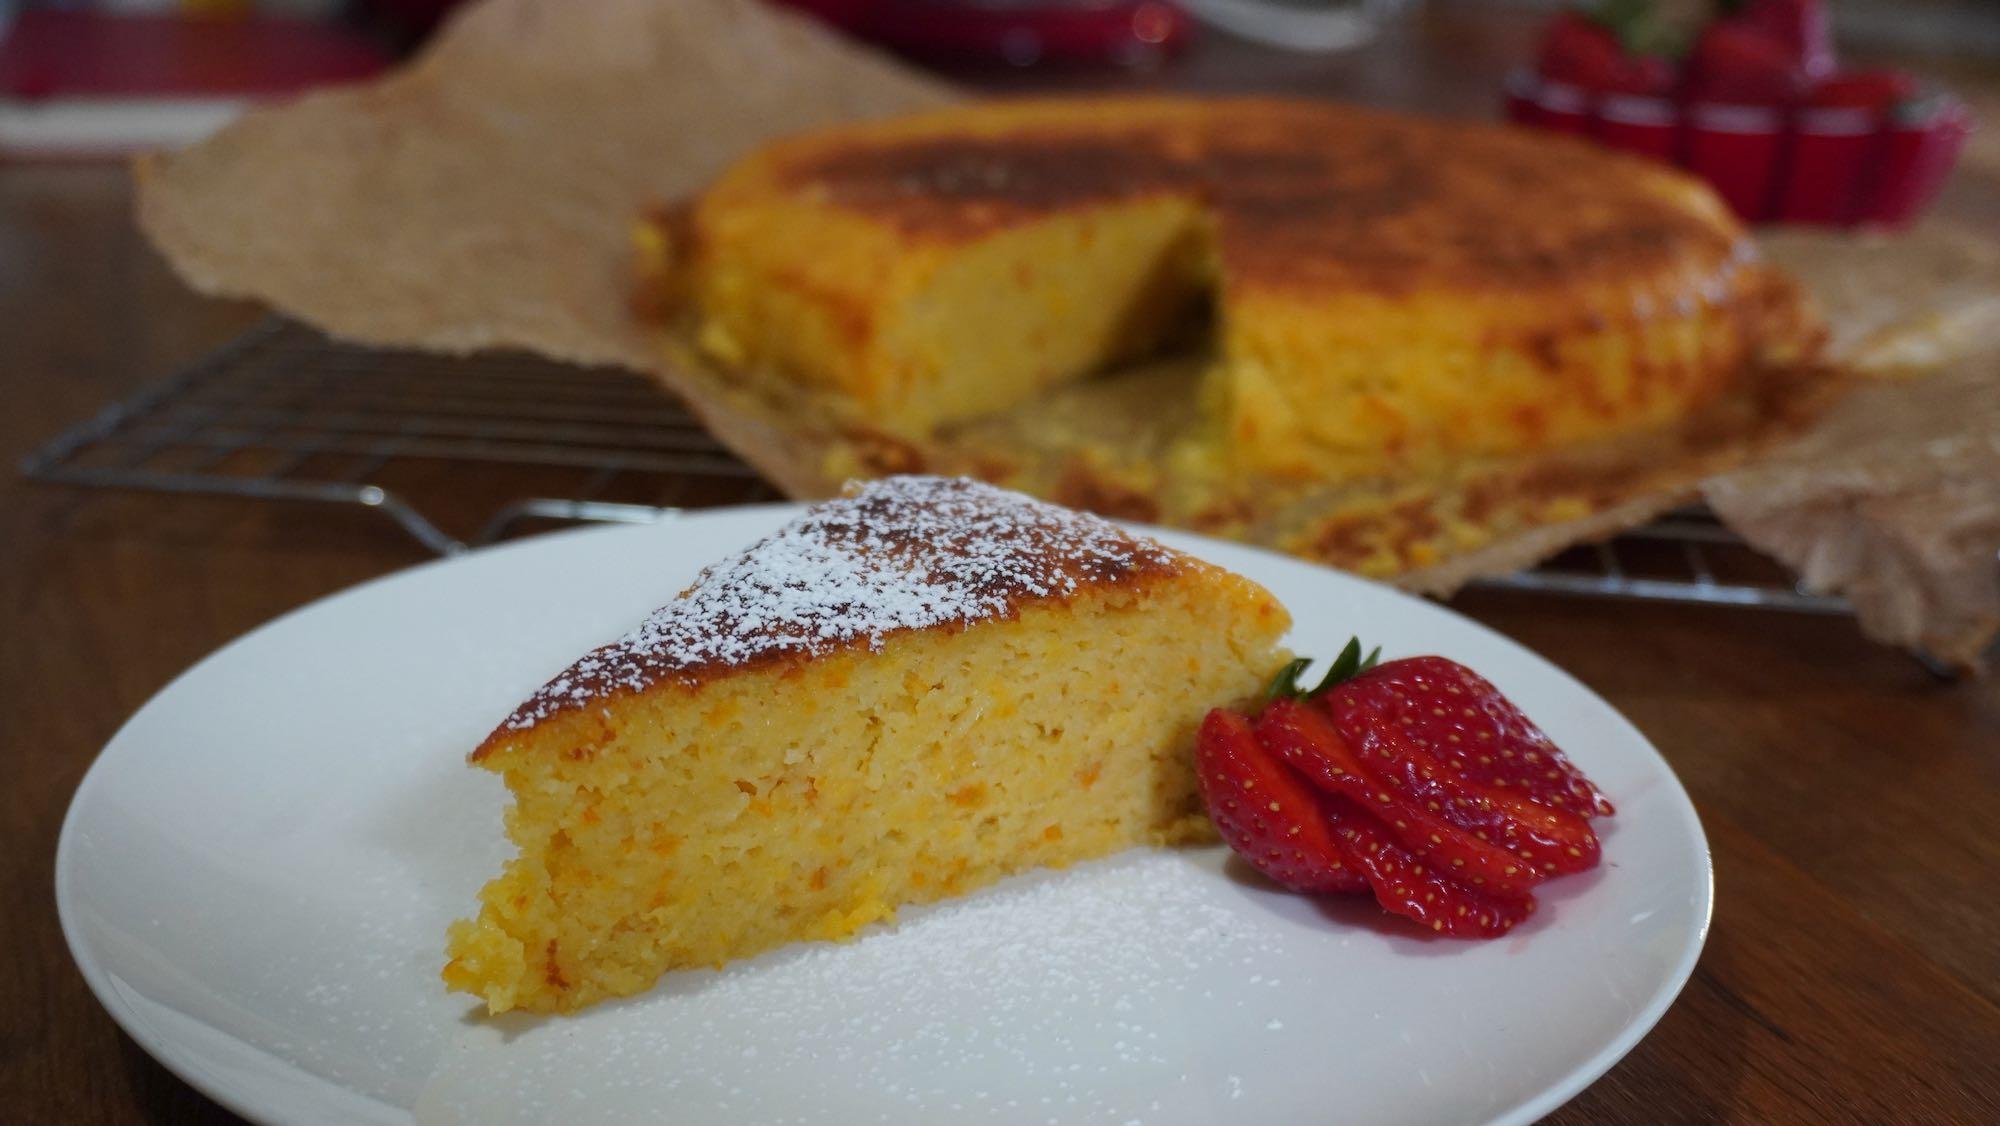 Flourless Orange & Almond Cake  Gluten Free – 5 ingredients